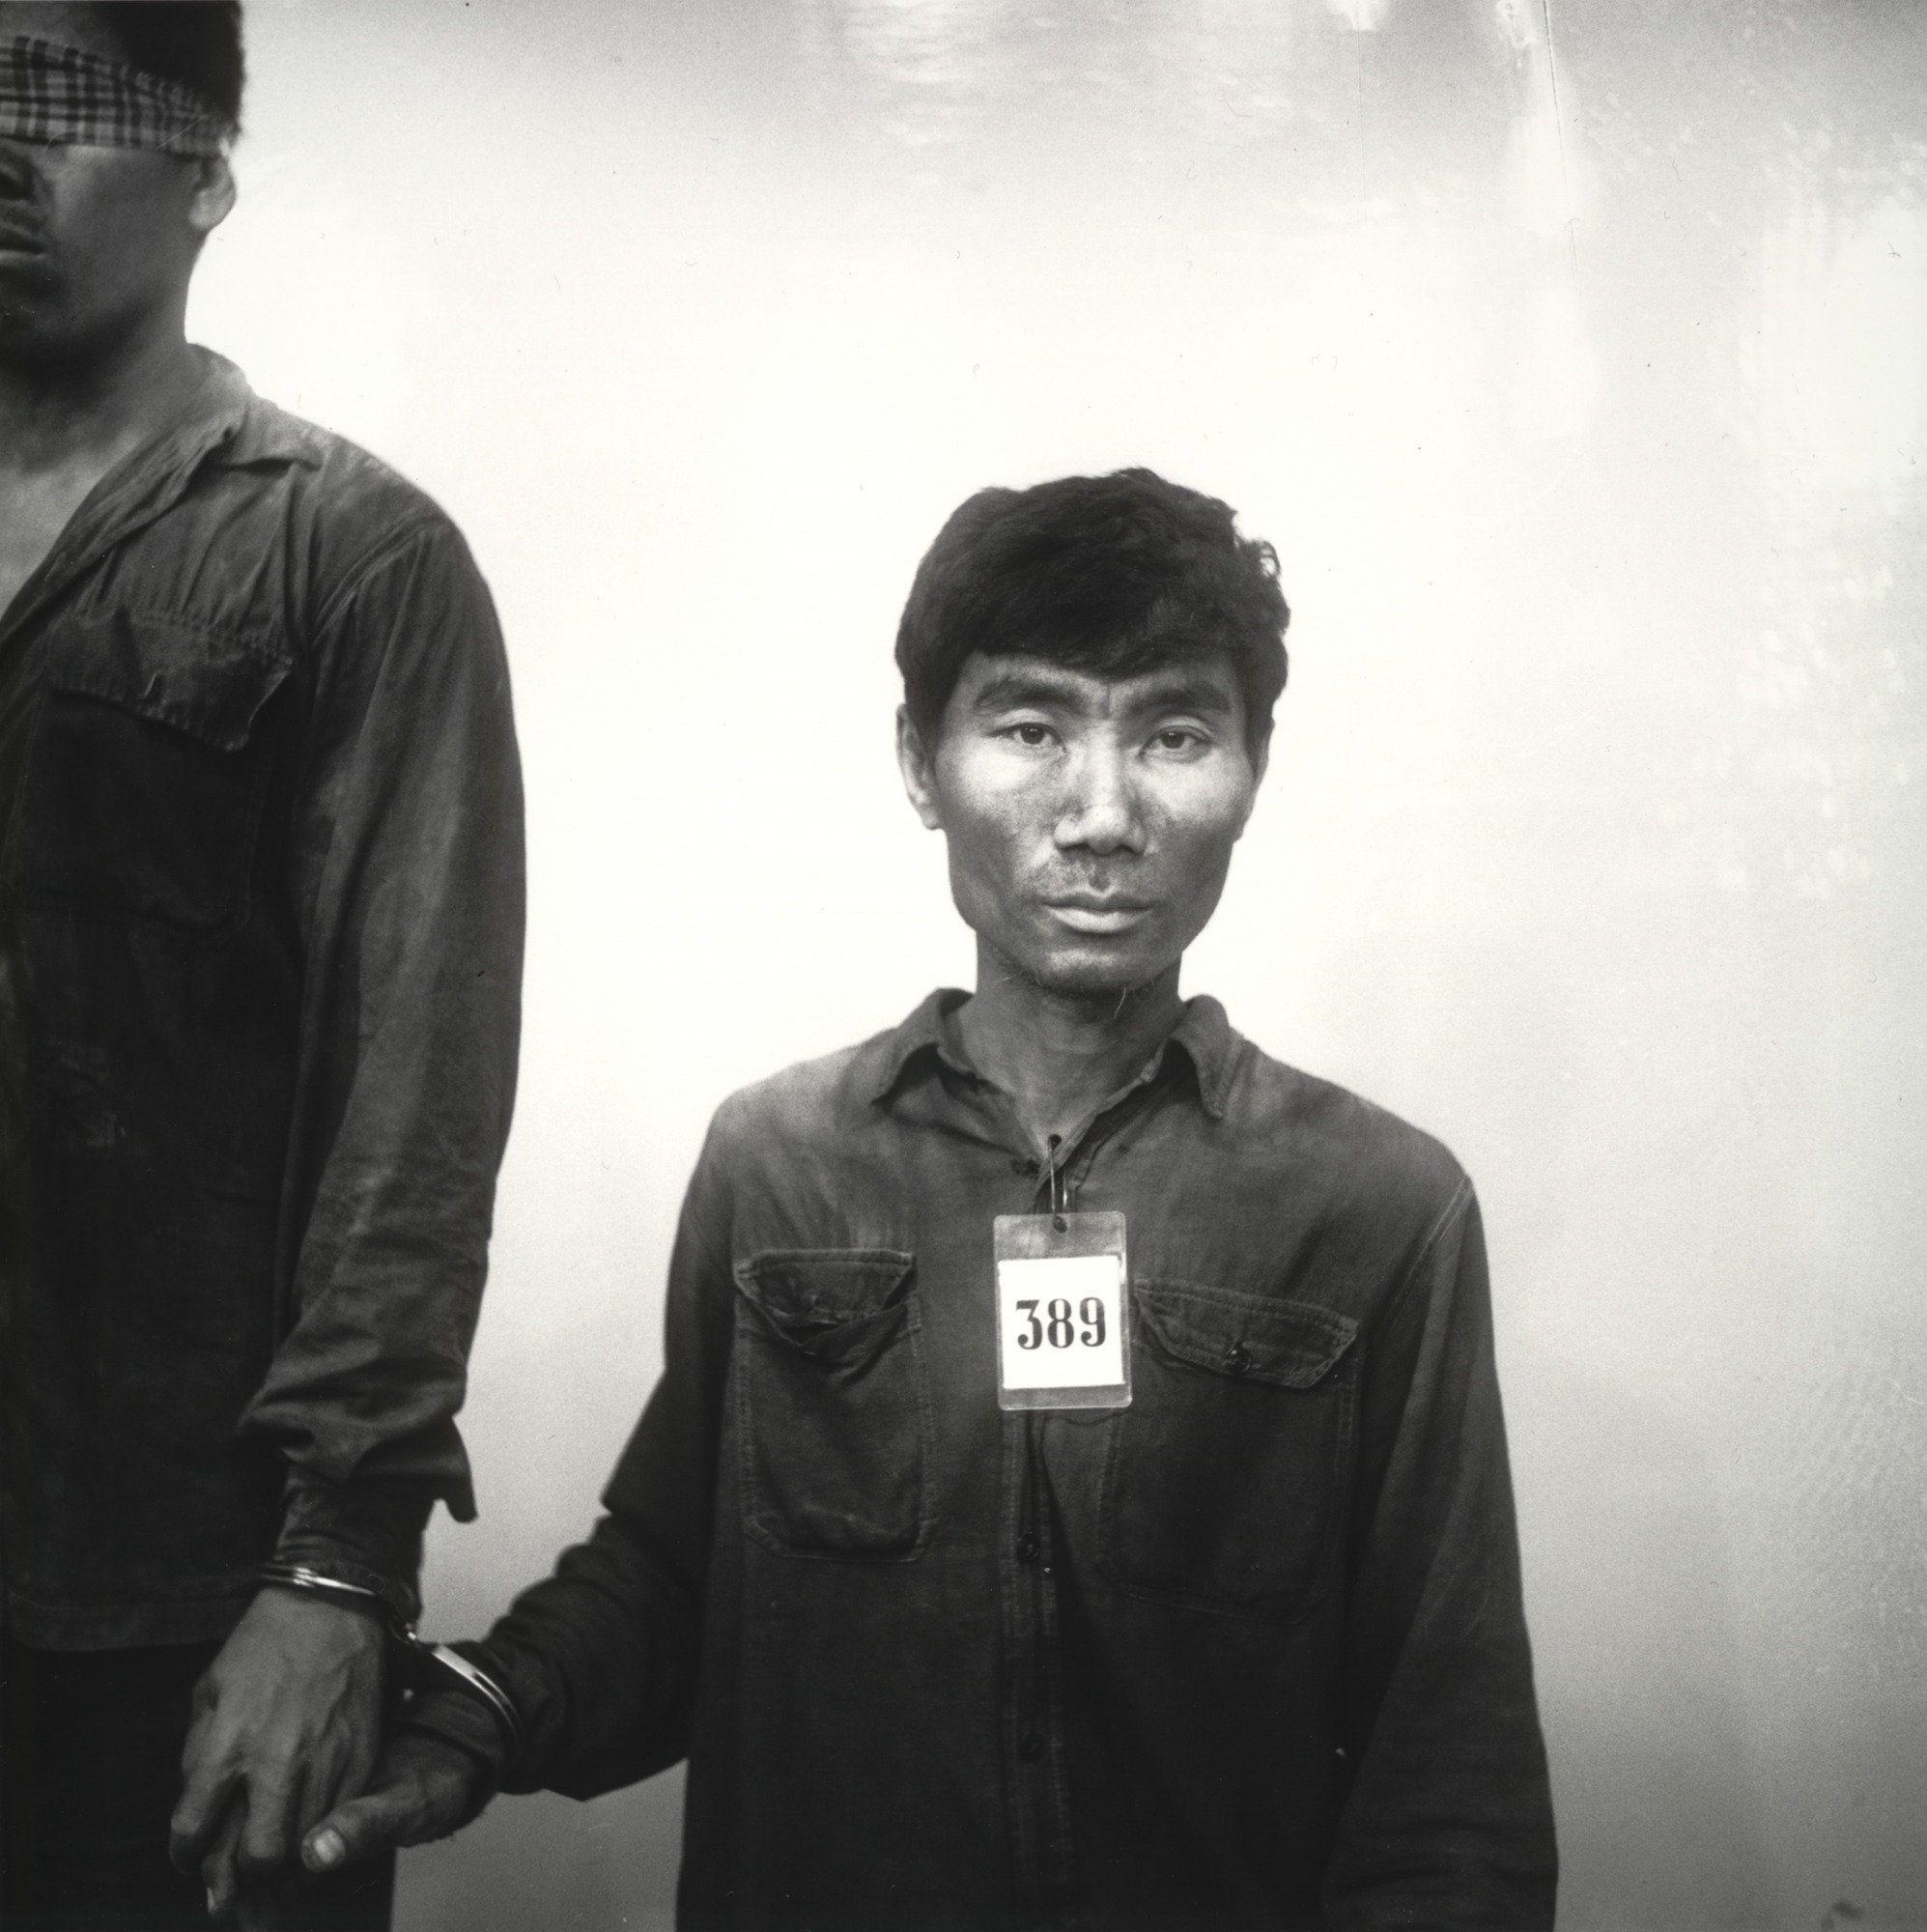 Nhem Ein. Untitled (prisoner #389 of the Khmer Rouge). 1975-79